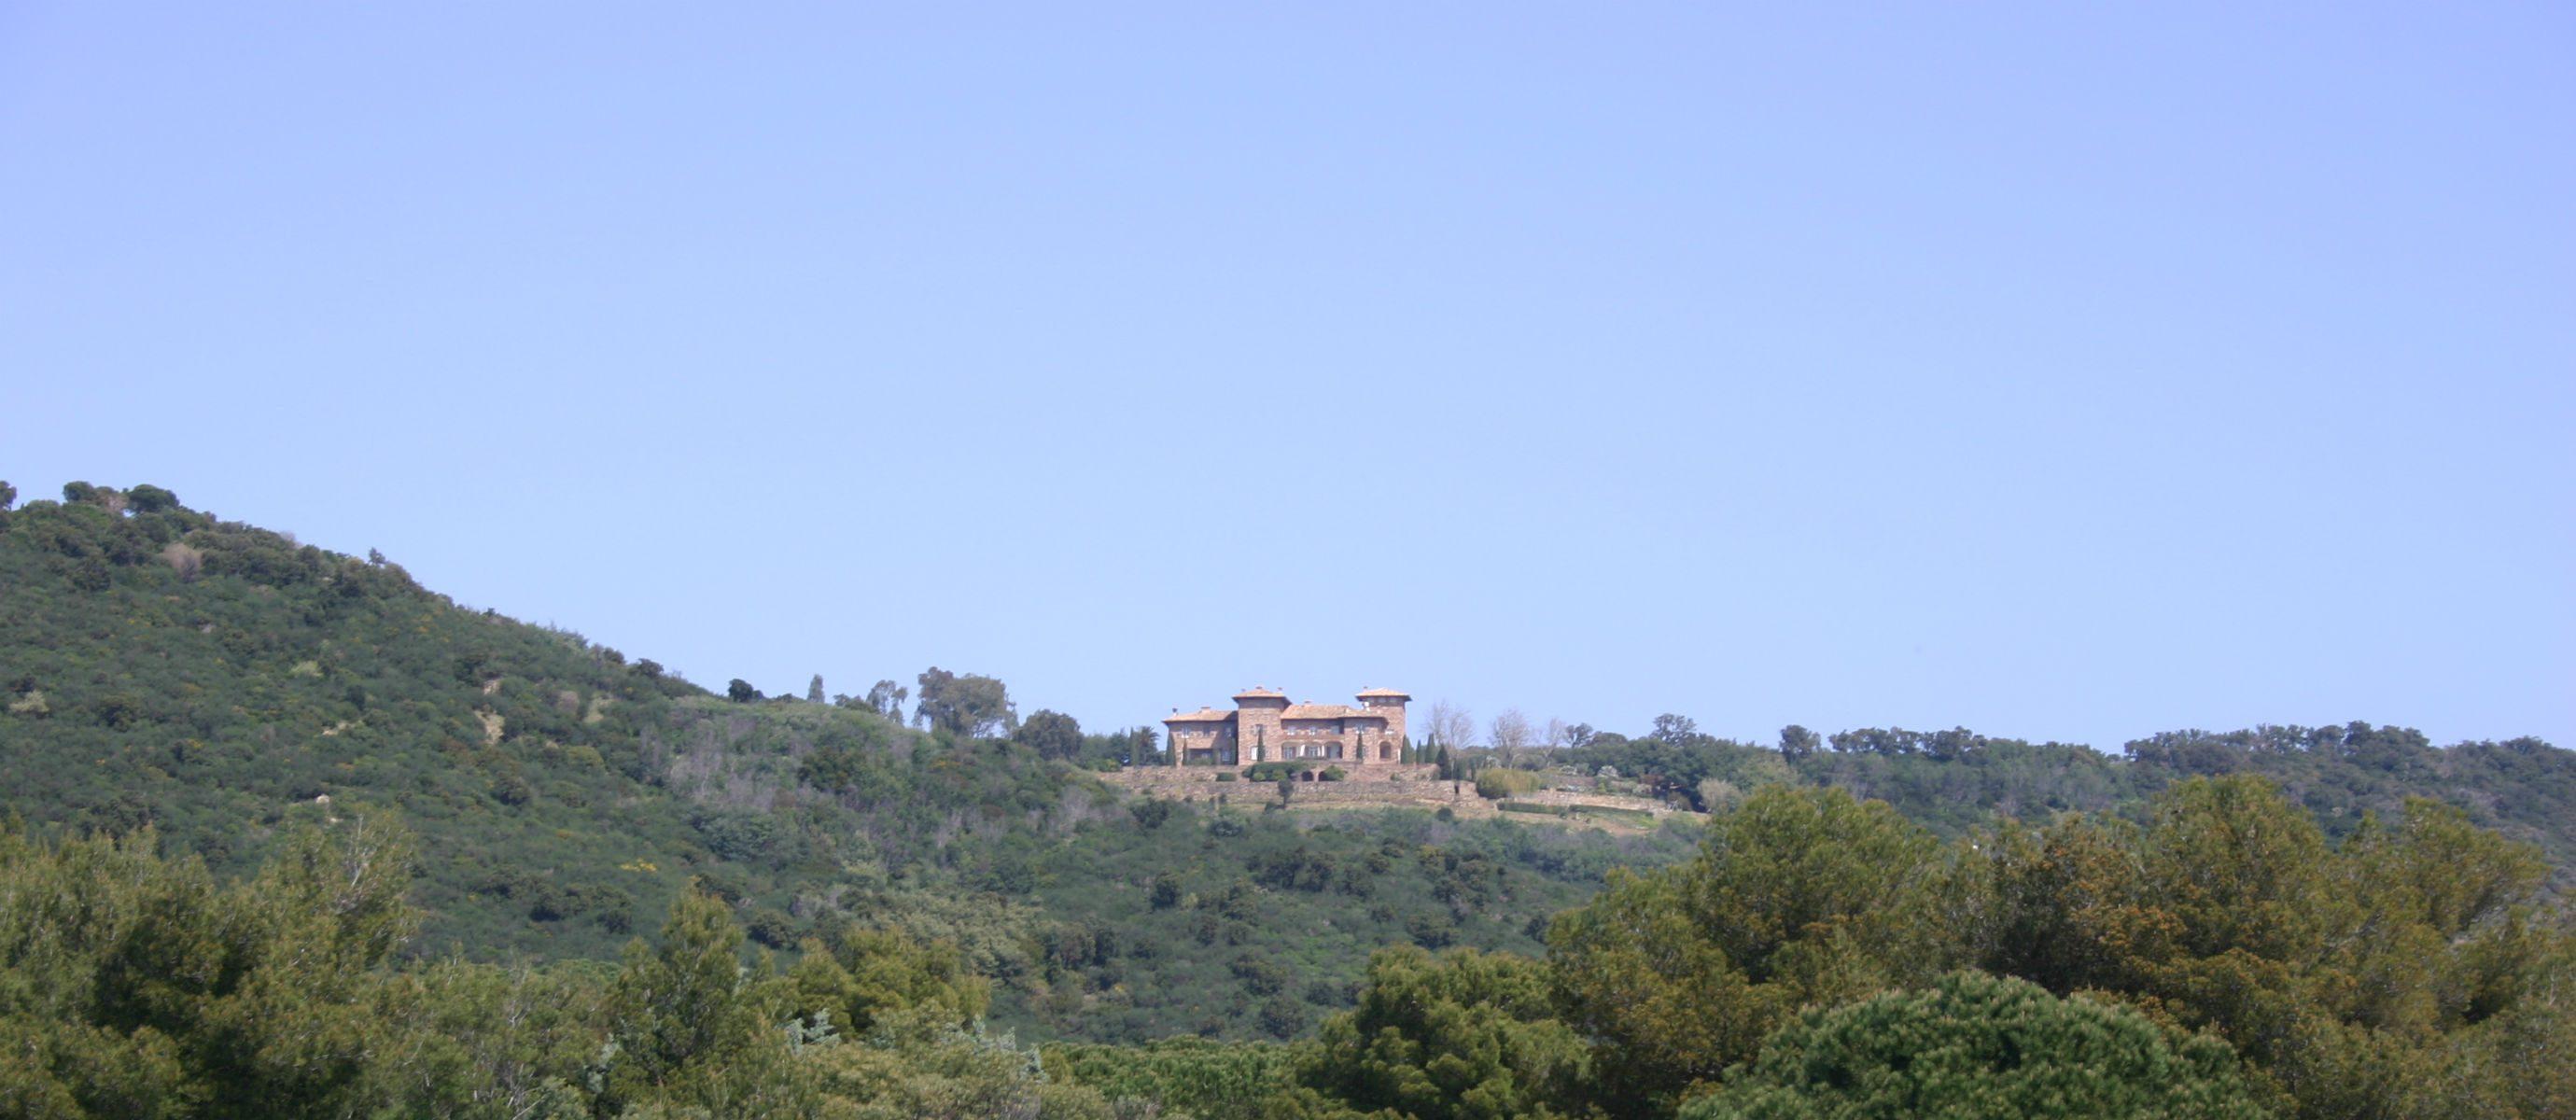 Mediterranean HorizonP17